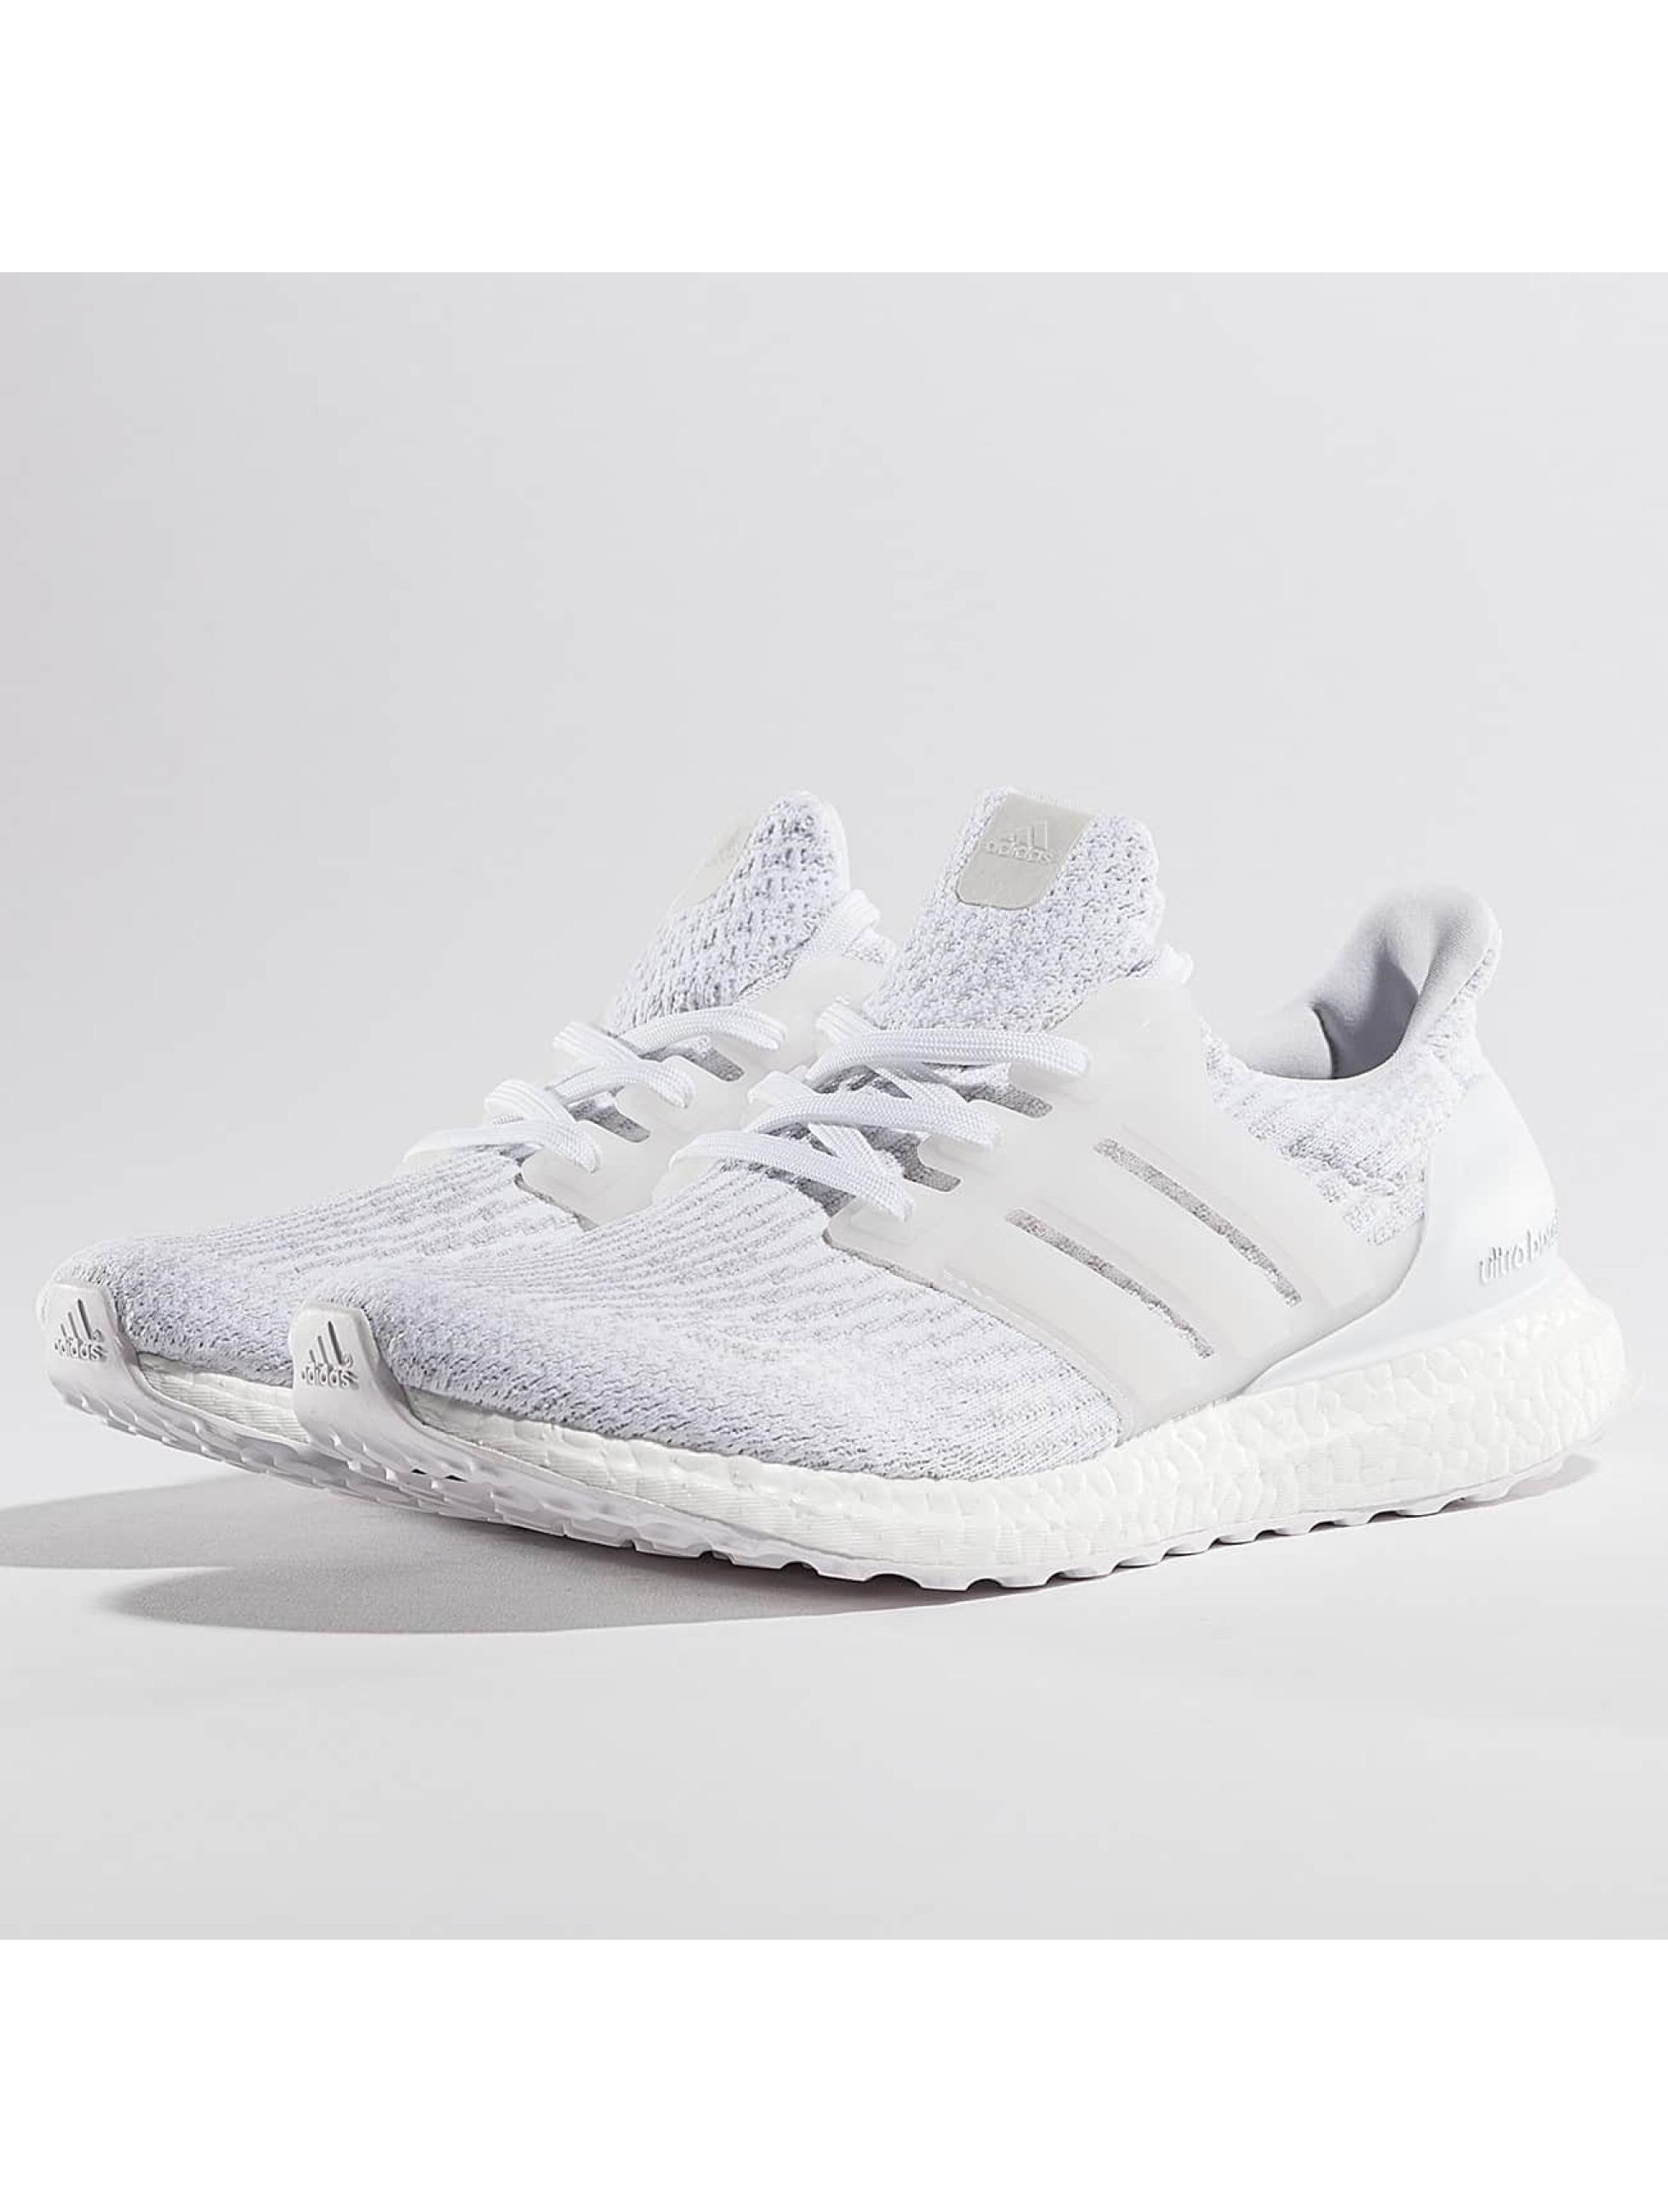 adidas Chaussures / Baskets Ultra Boost en blanc